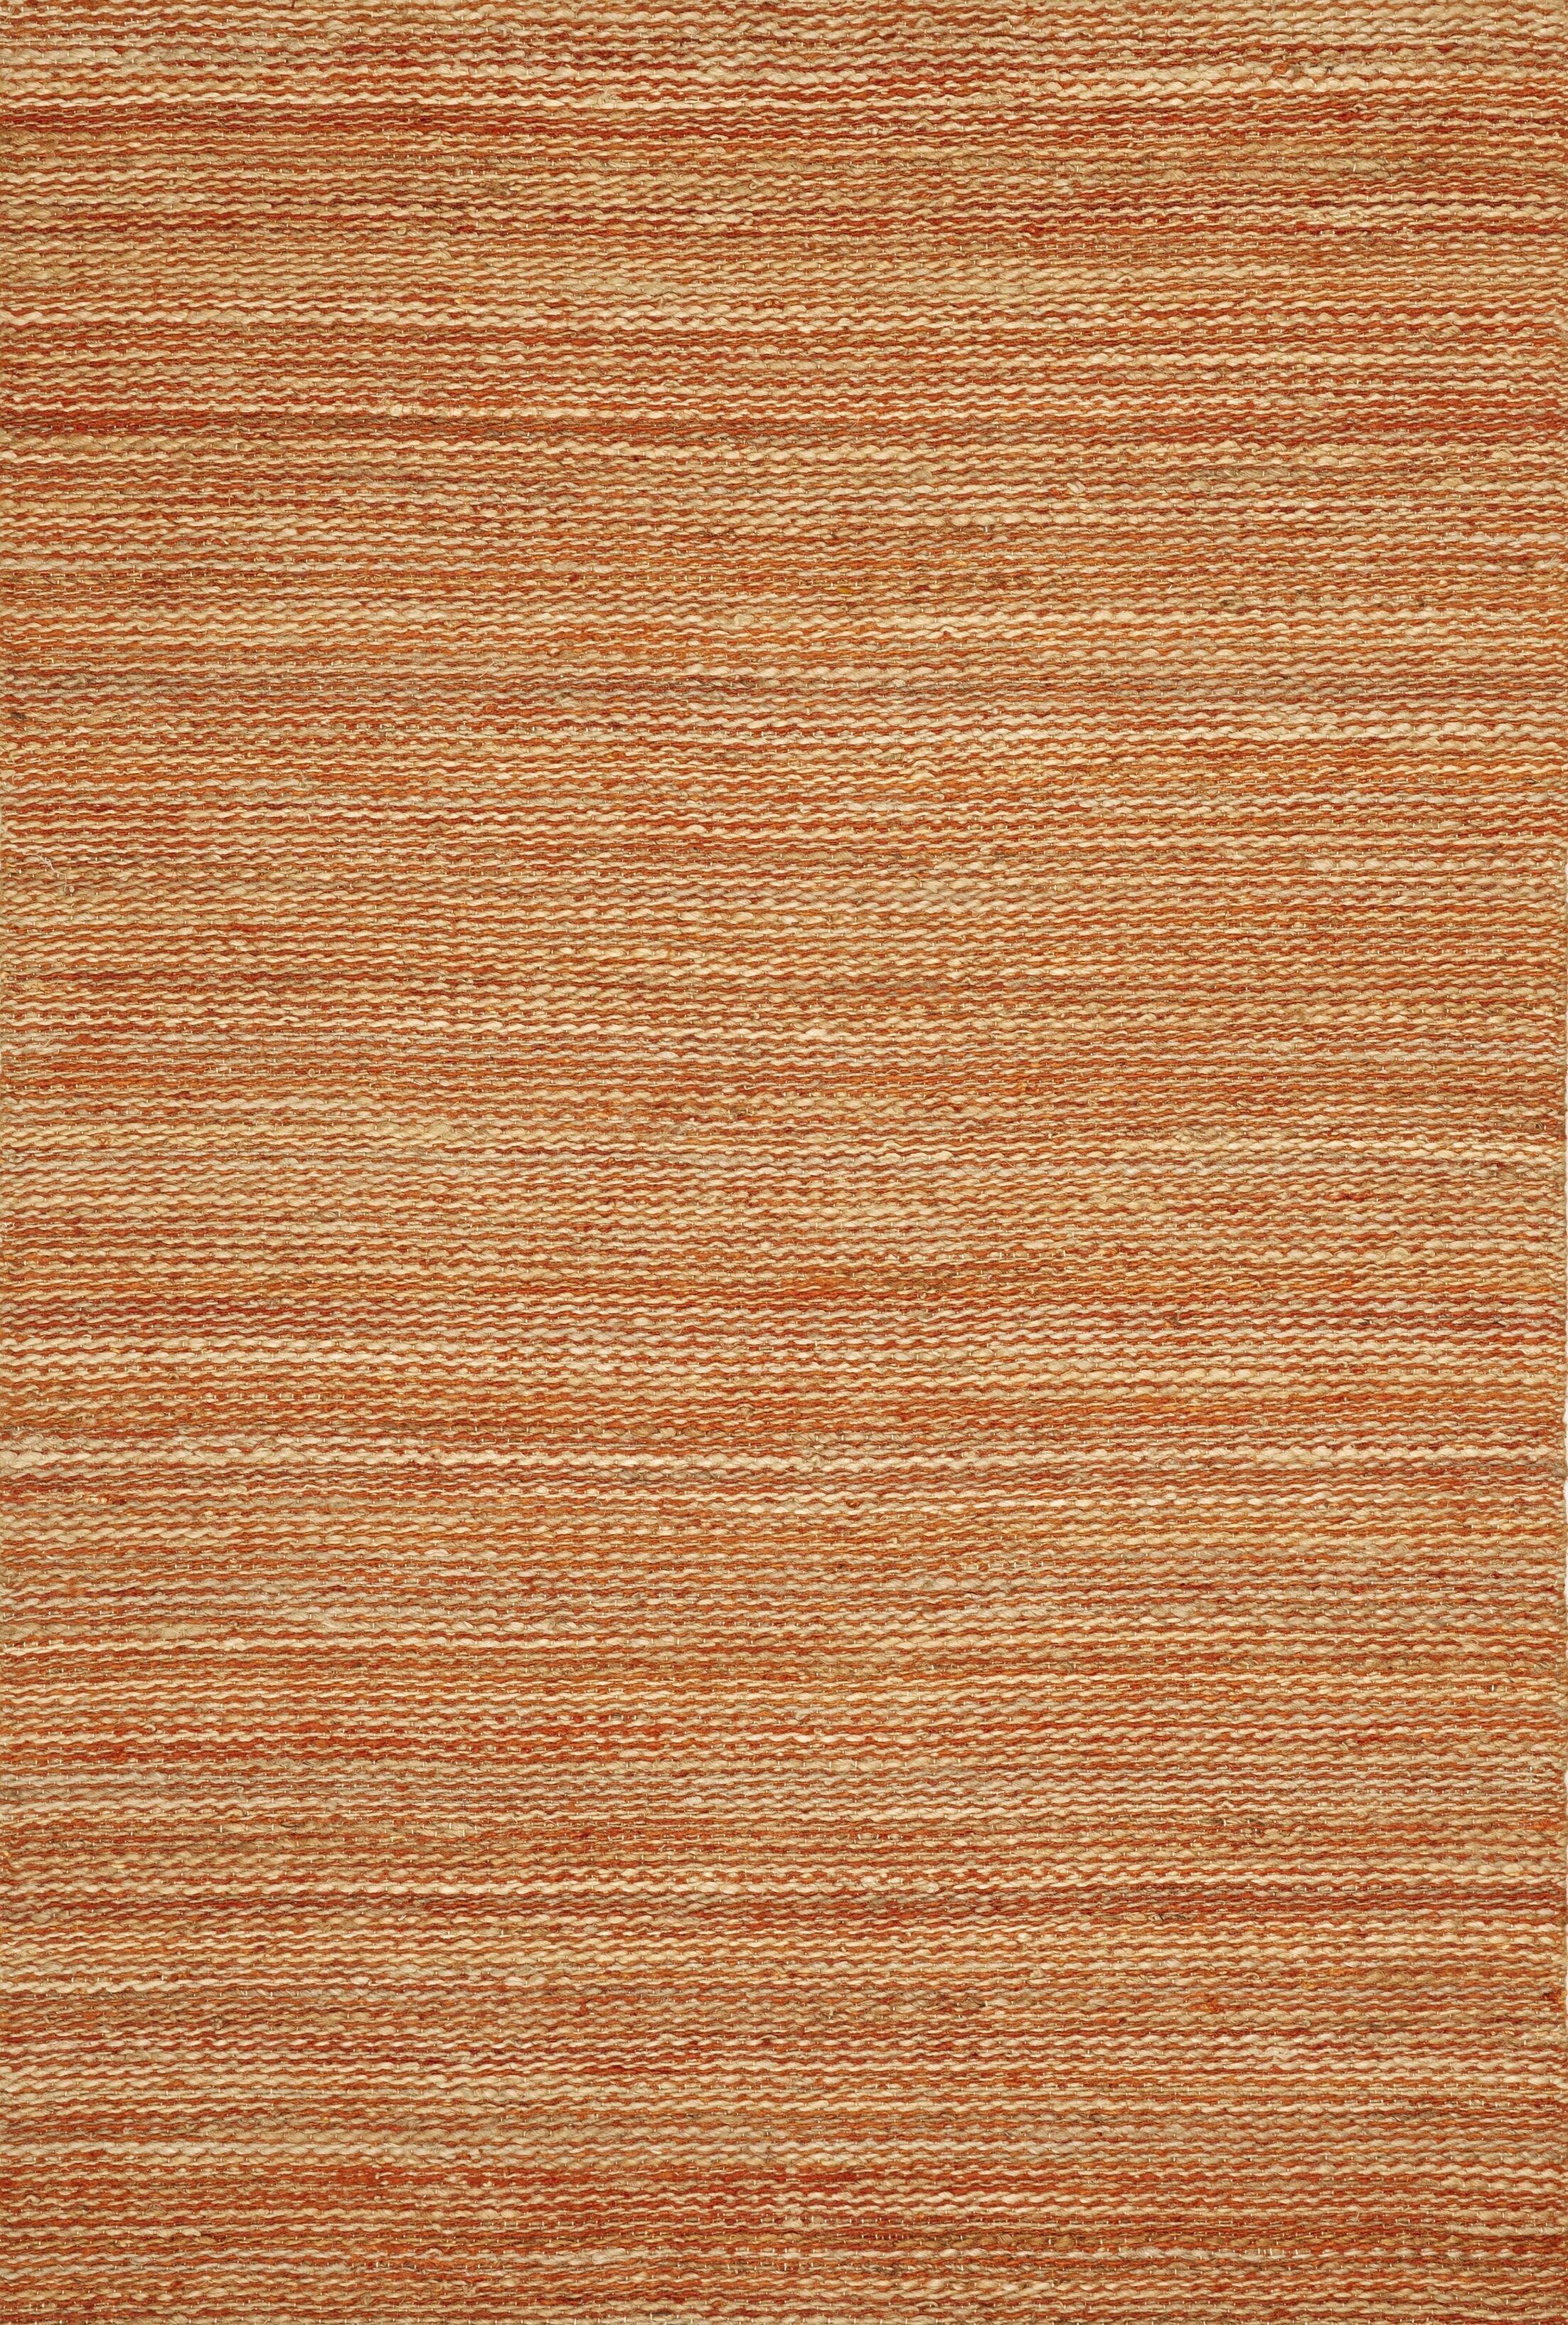 Dulce Mandarin Area Rug Rug Size: Rectangle 9' x 13'